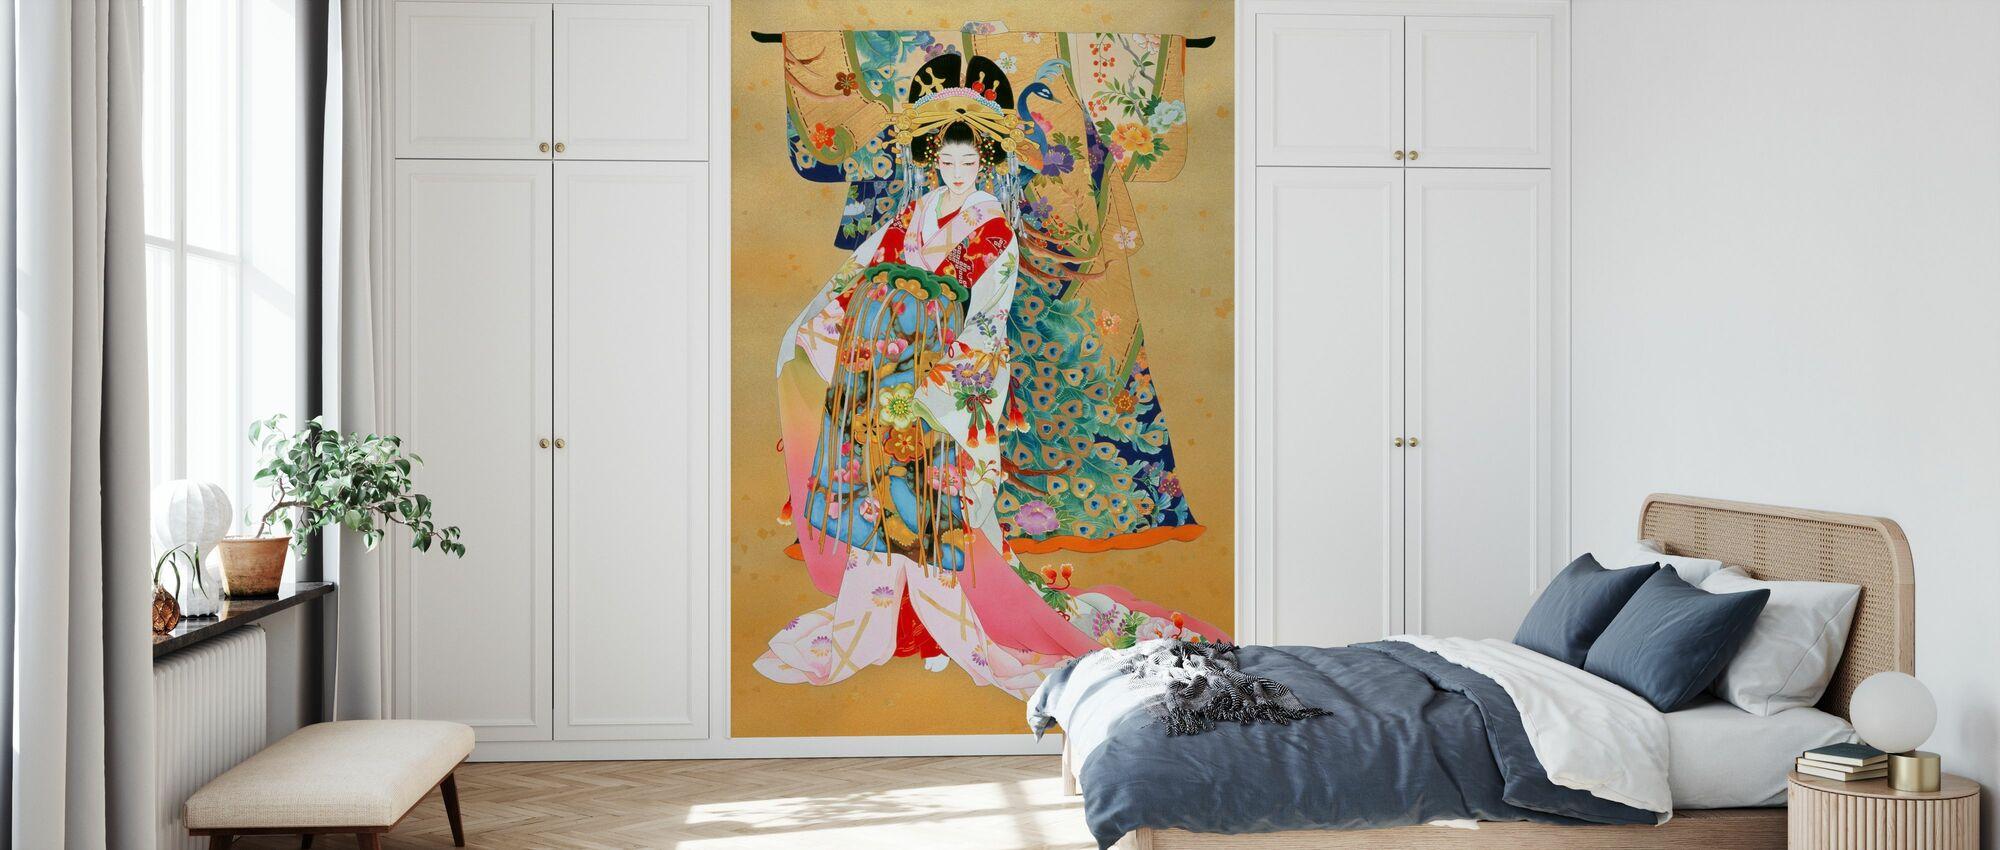 Kogane - Wallpaper - Bedroom